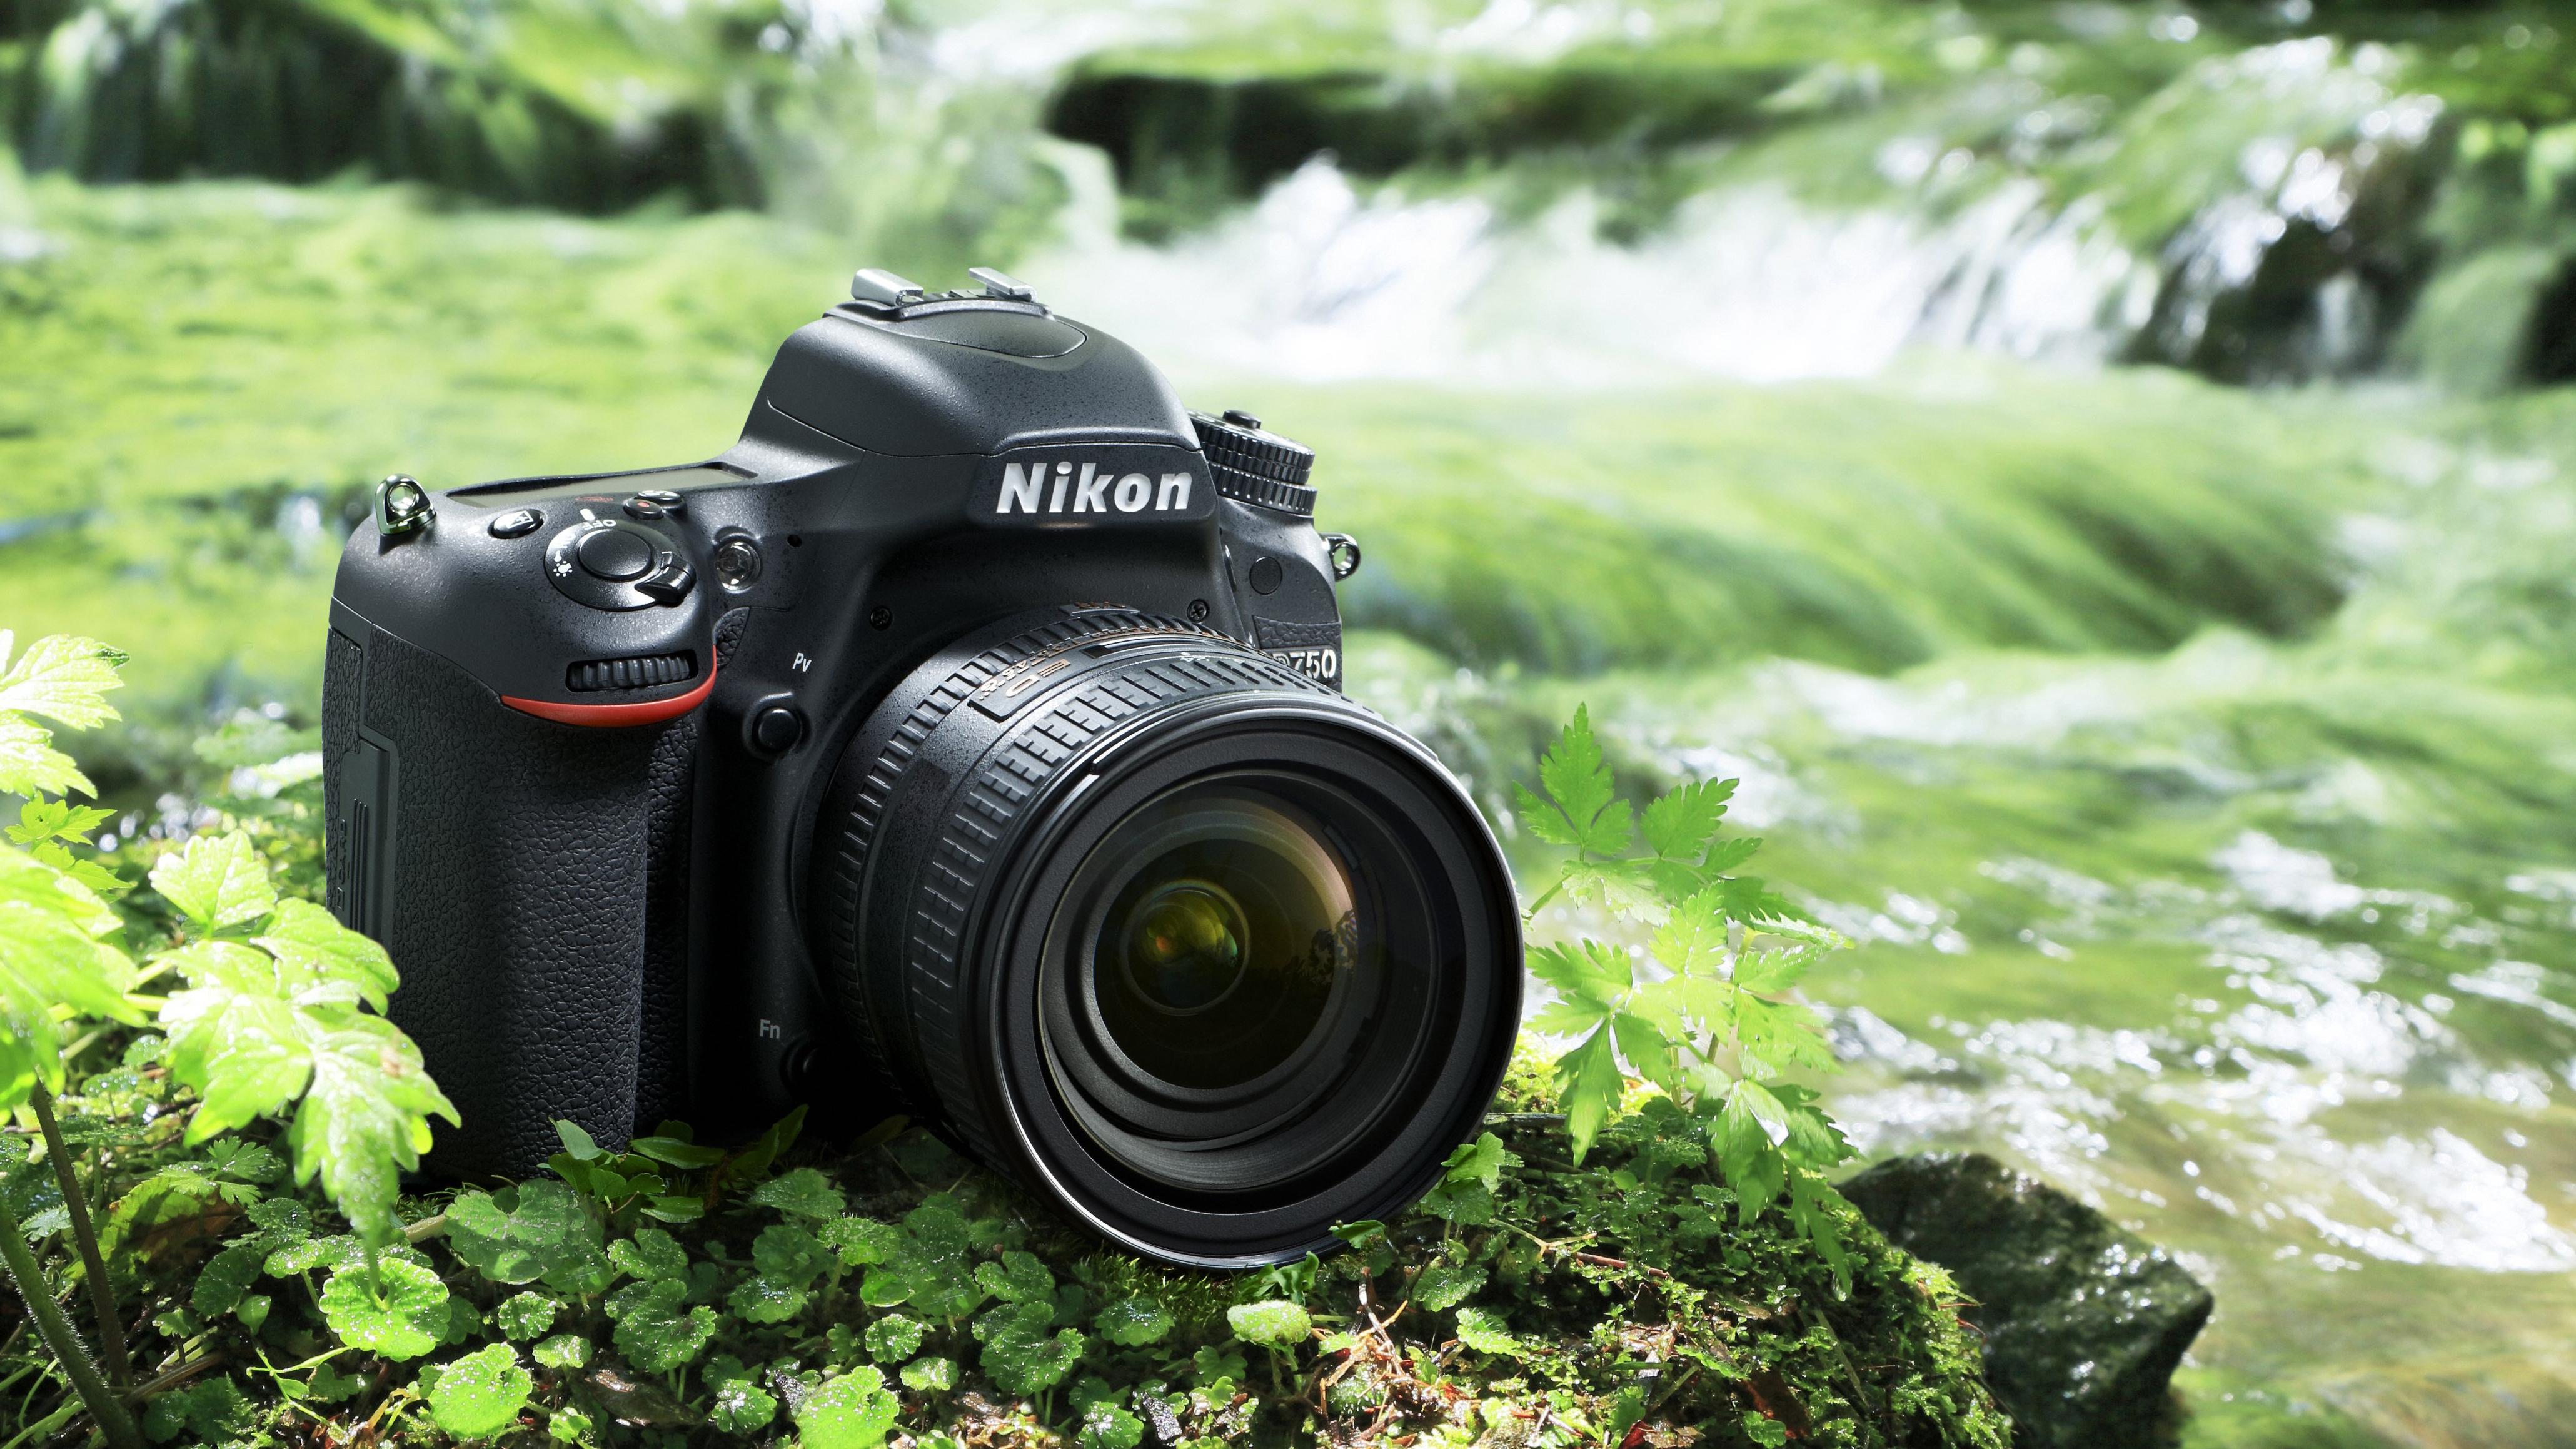 Best camera: Nikon D750